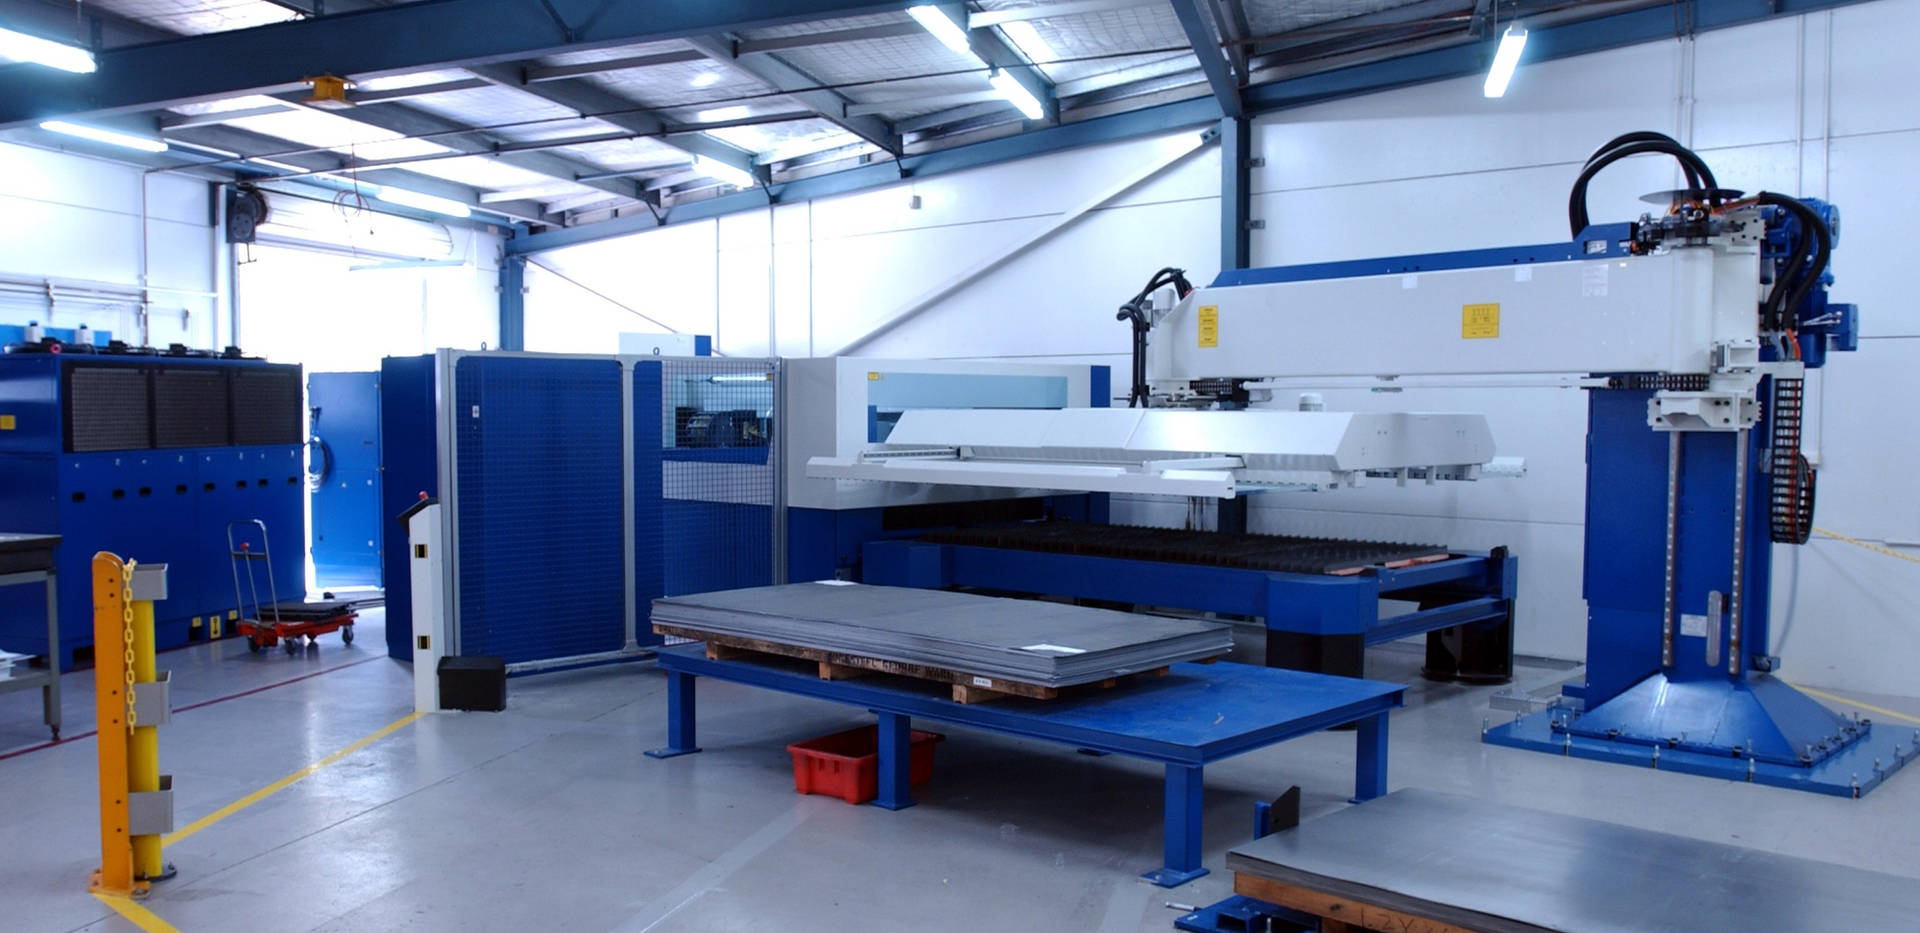 CNC Laser Cutting with Automatic Sheet Feeder at Interfab in Sydney